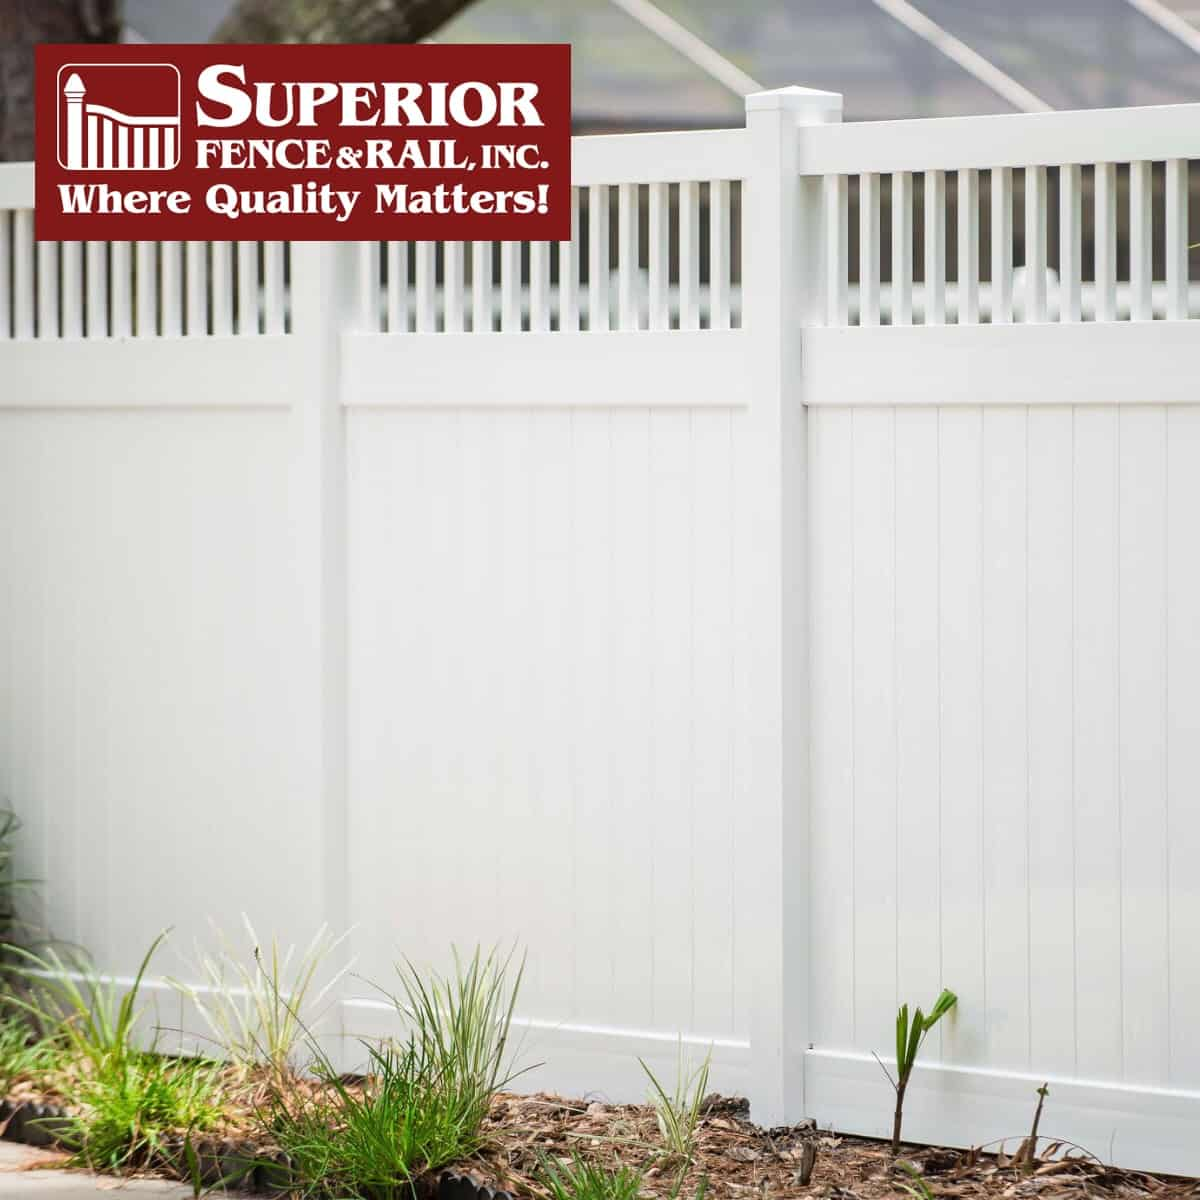 Benson fence company contractor